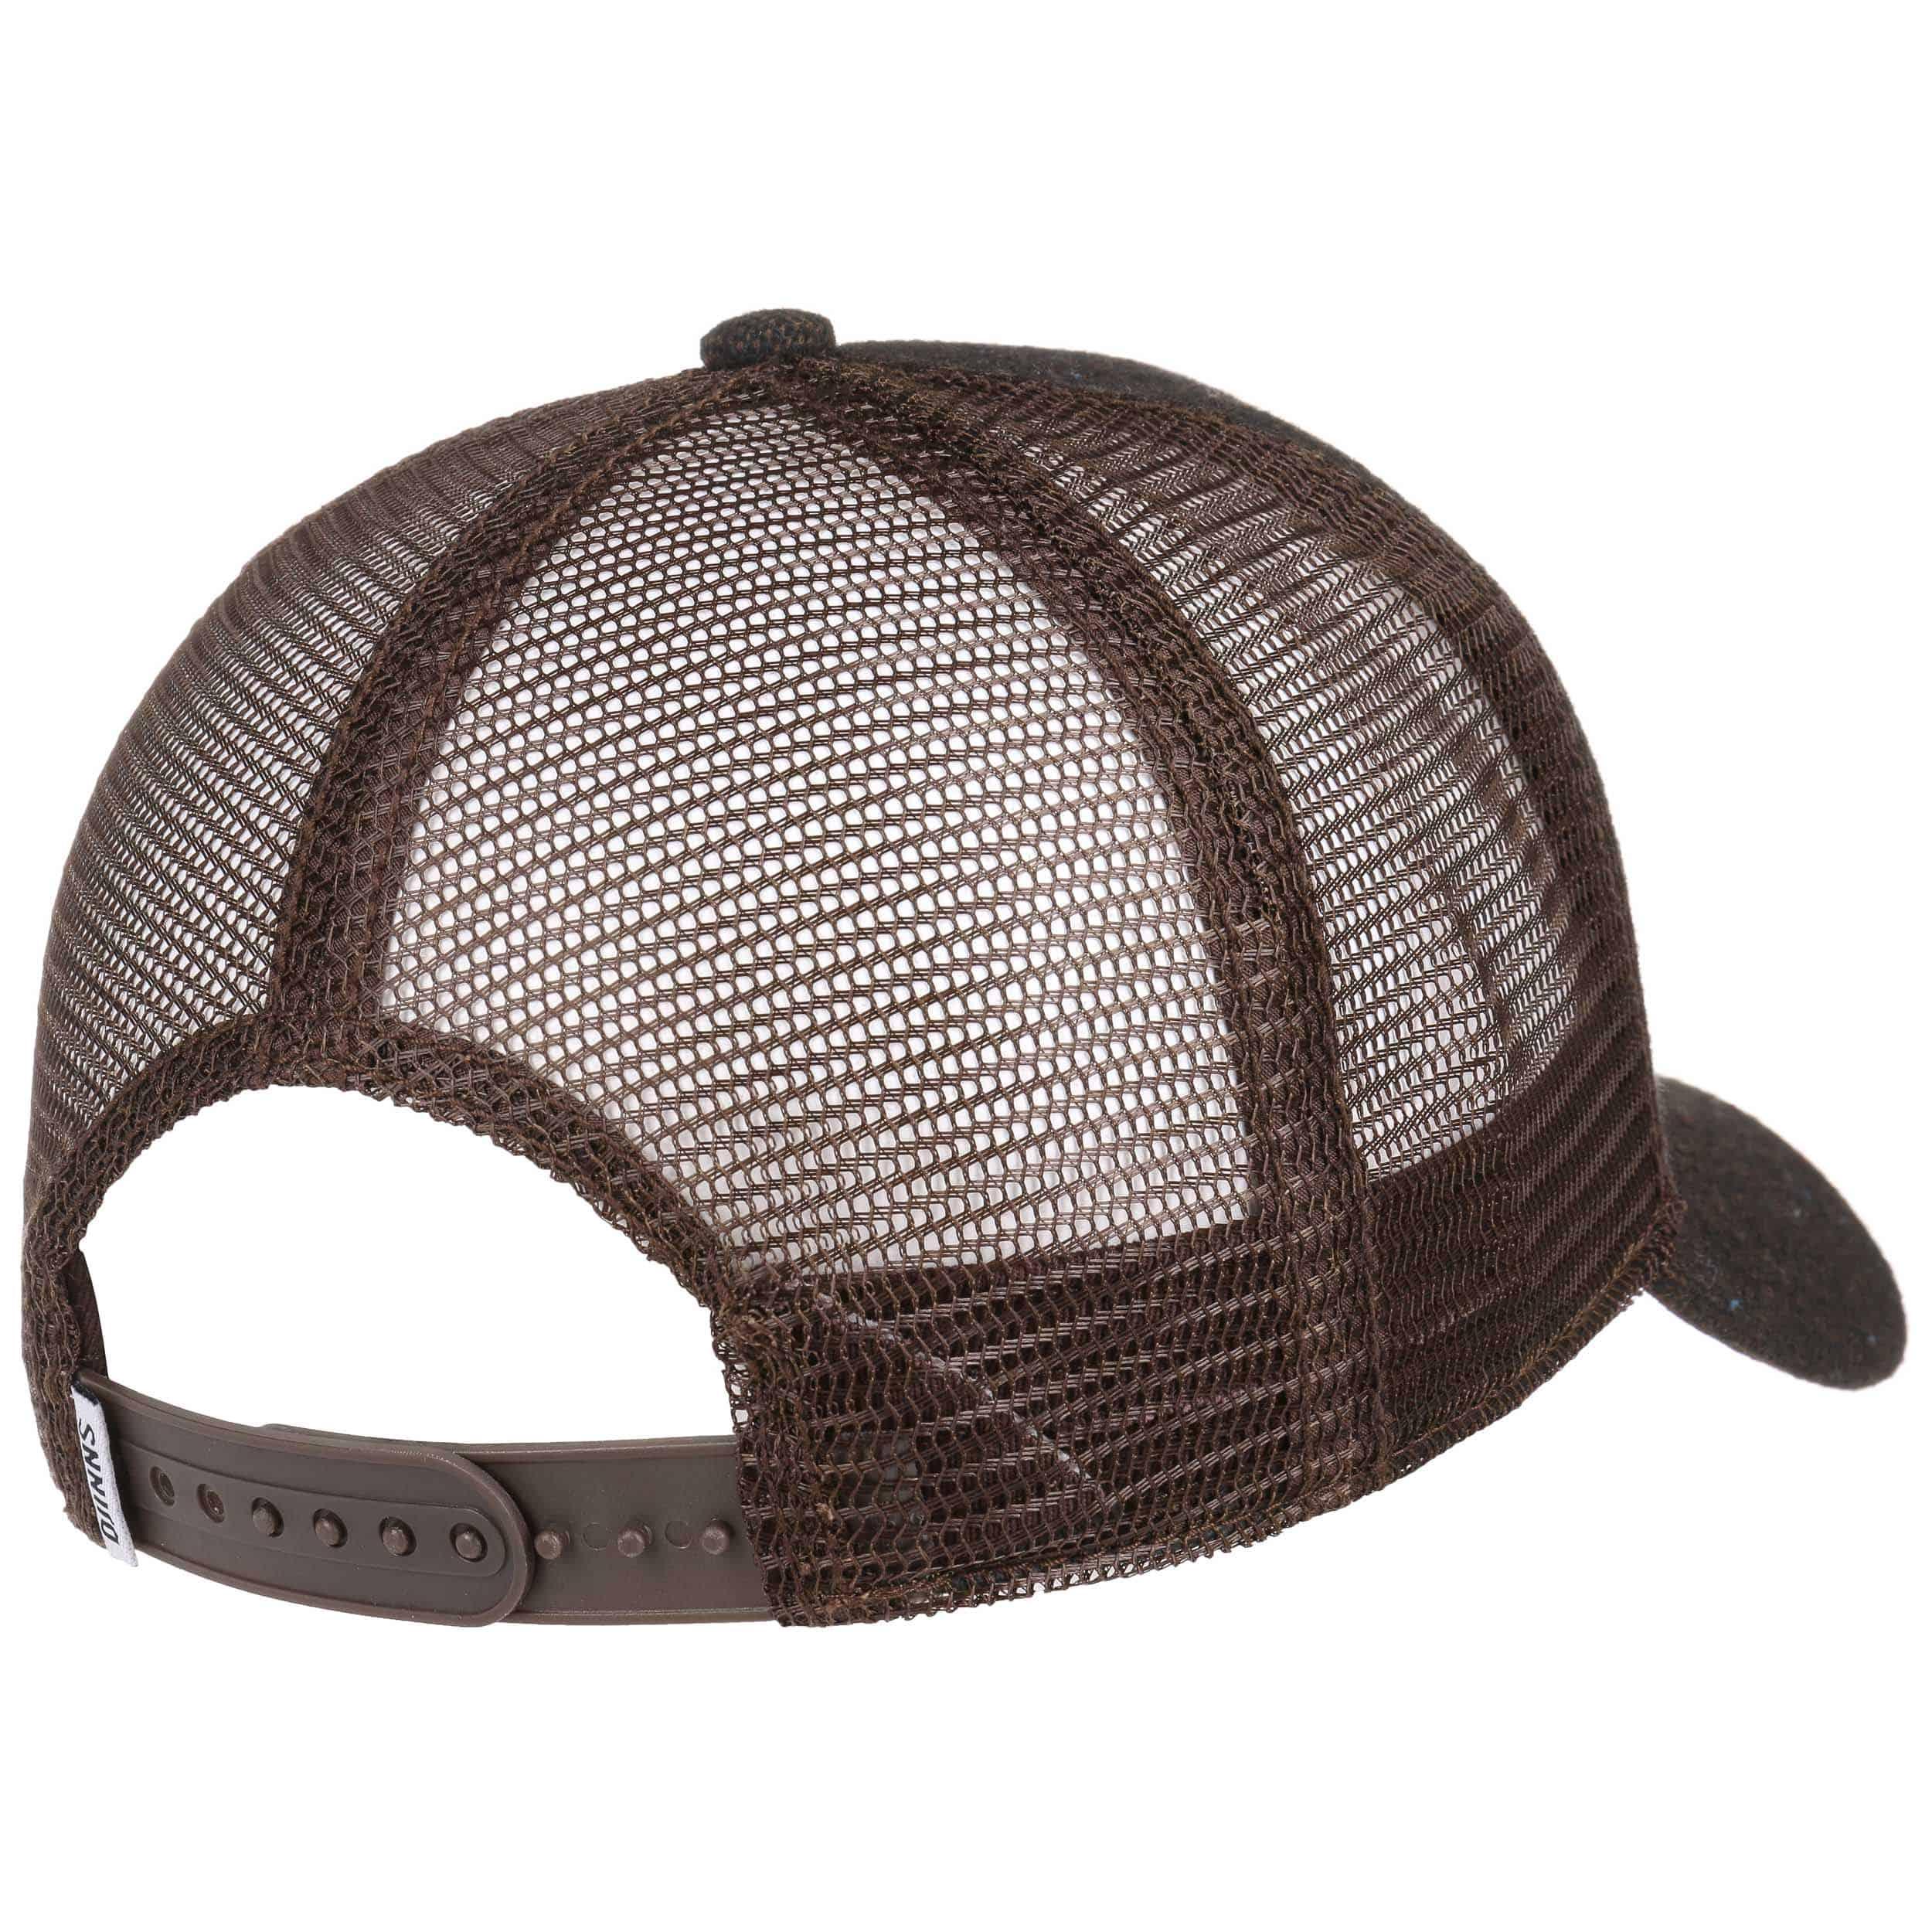 felt rubber hft trucker cap by djinns eur 24 99 hats. Black Bedroom Furniture Sets. Home Design Ideas